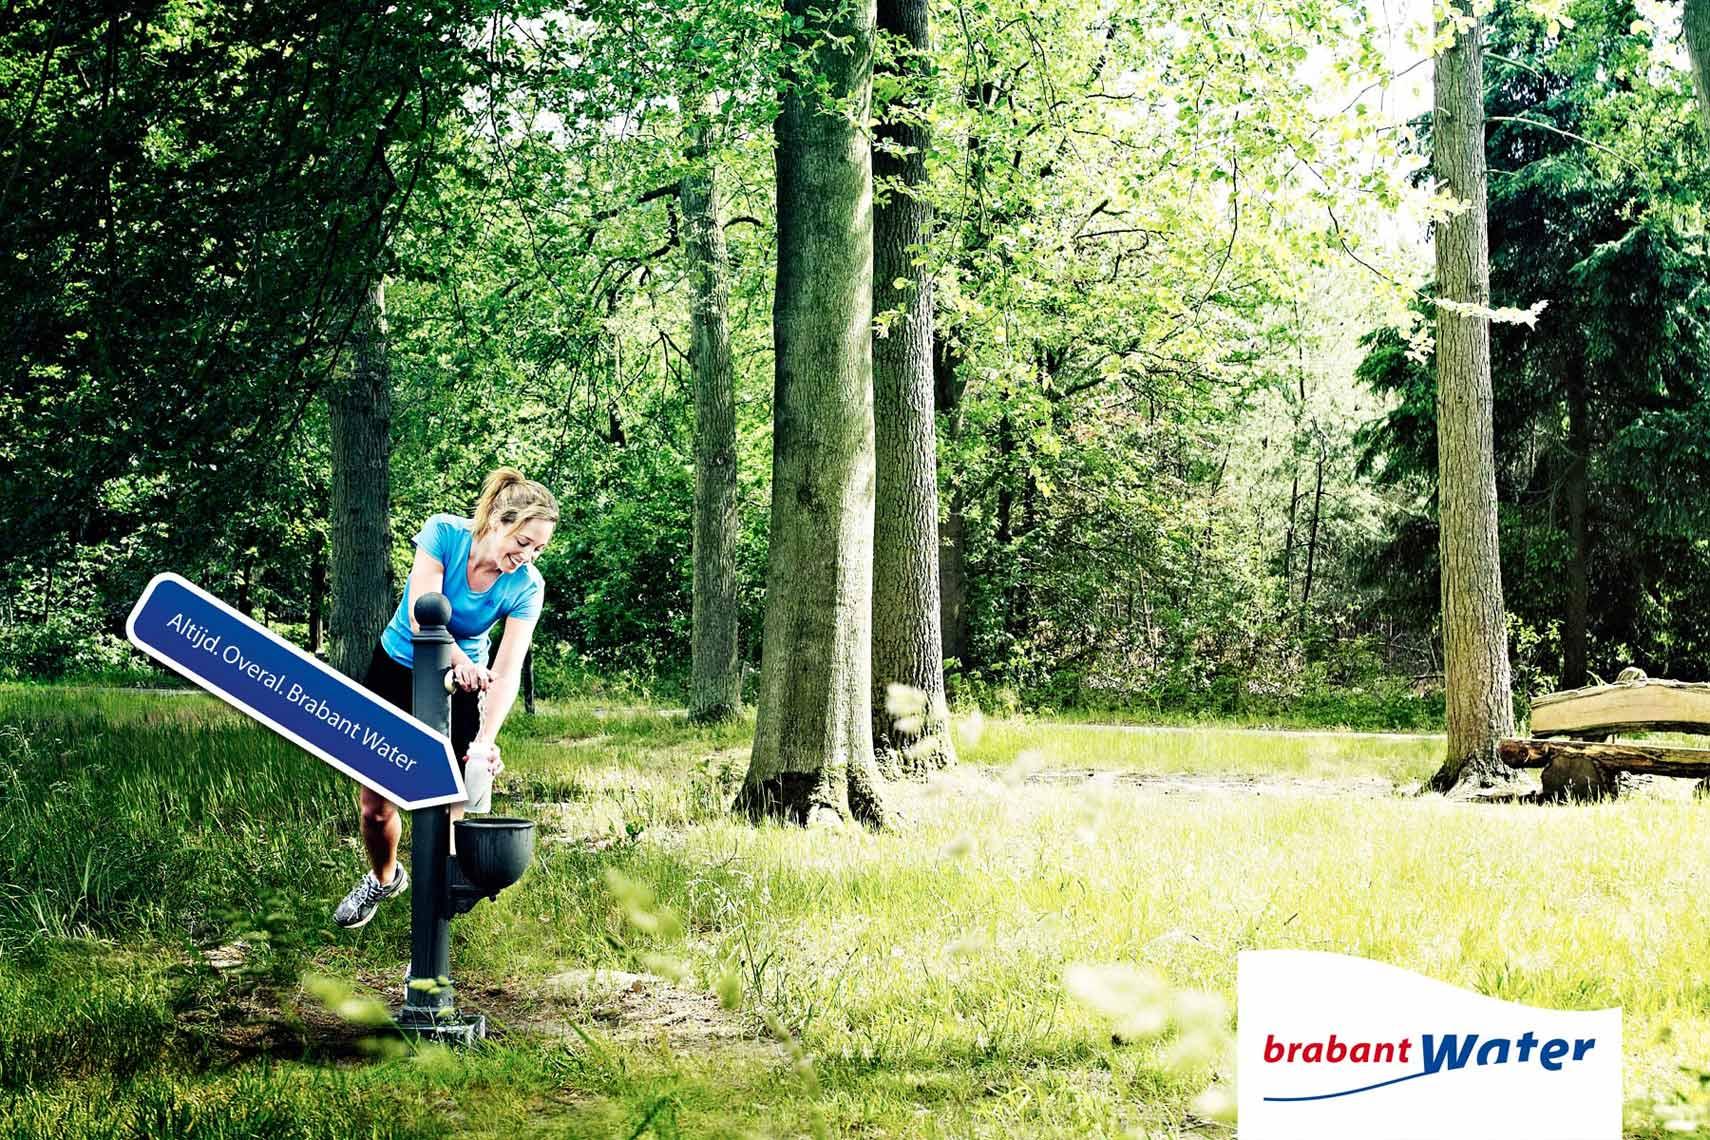 brabant-water-reclamefotografie-pim-vuik-fotografie-rotterdam-02.jpg